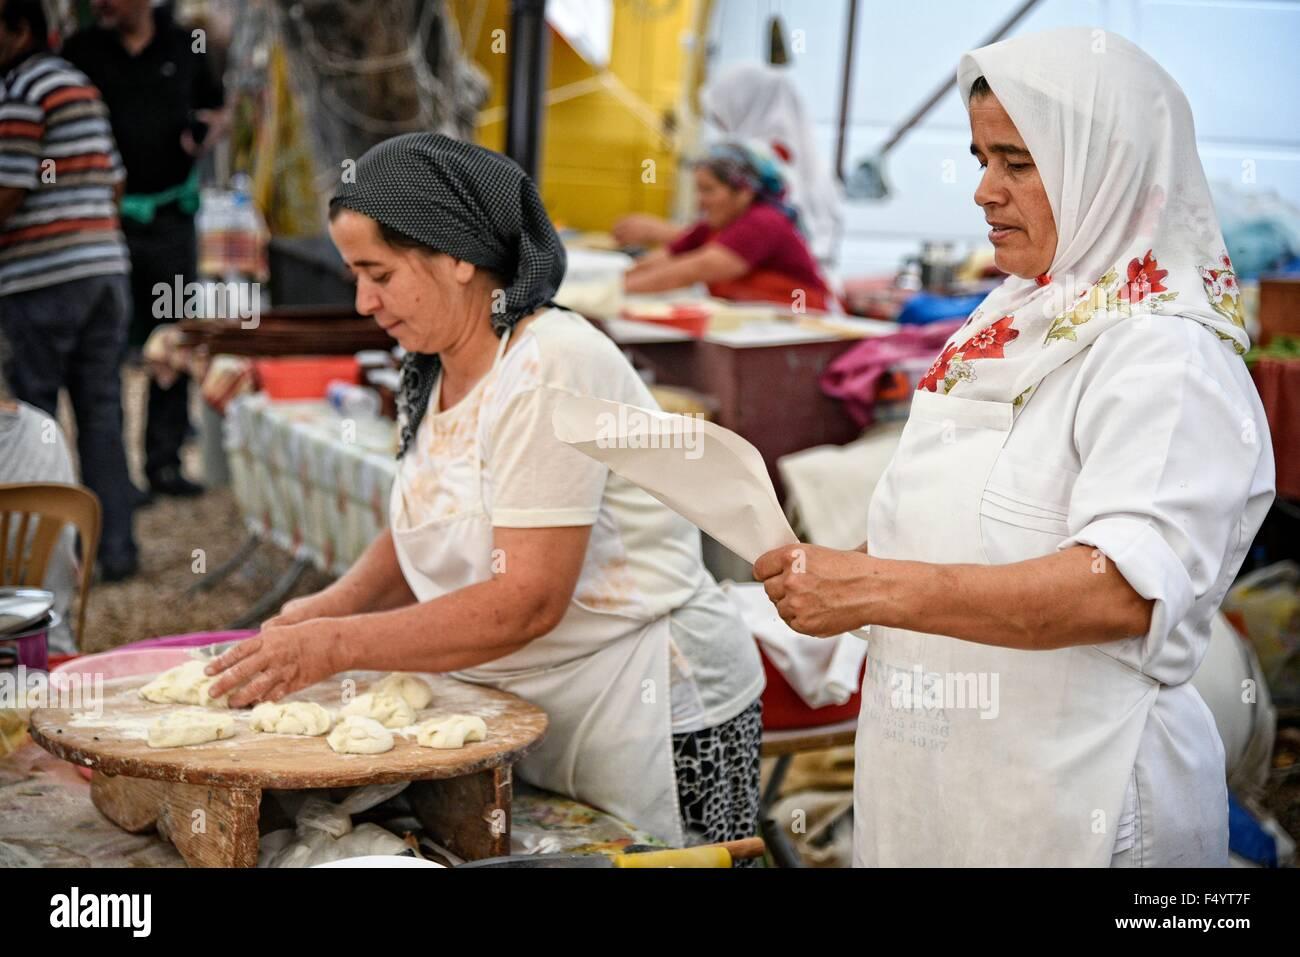 KAS Antalya Turkey Friday Market making traditional pancakes on a cast iron grill. - Stock Image